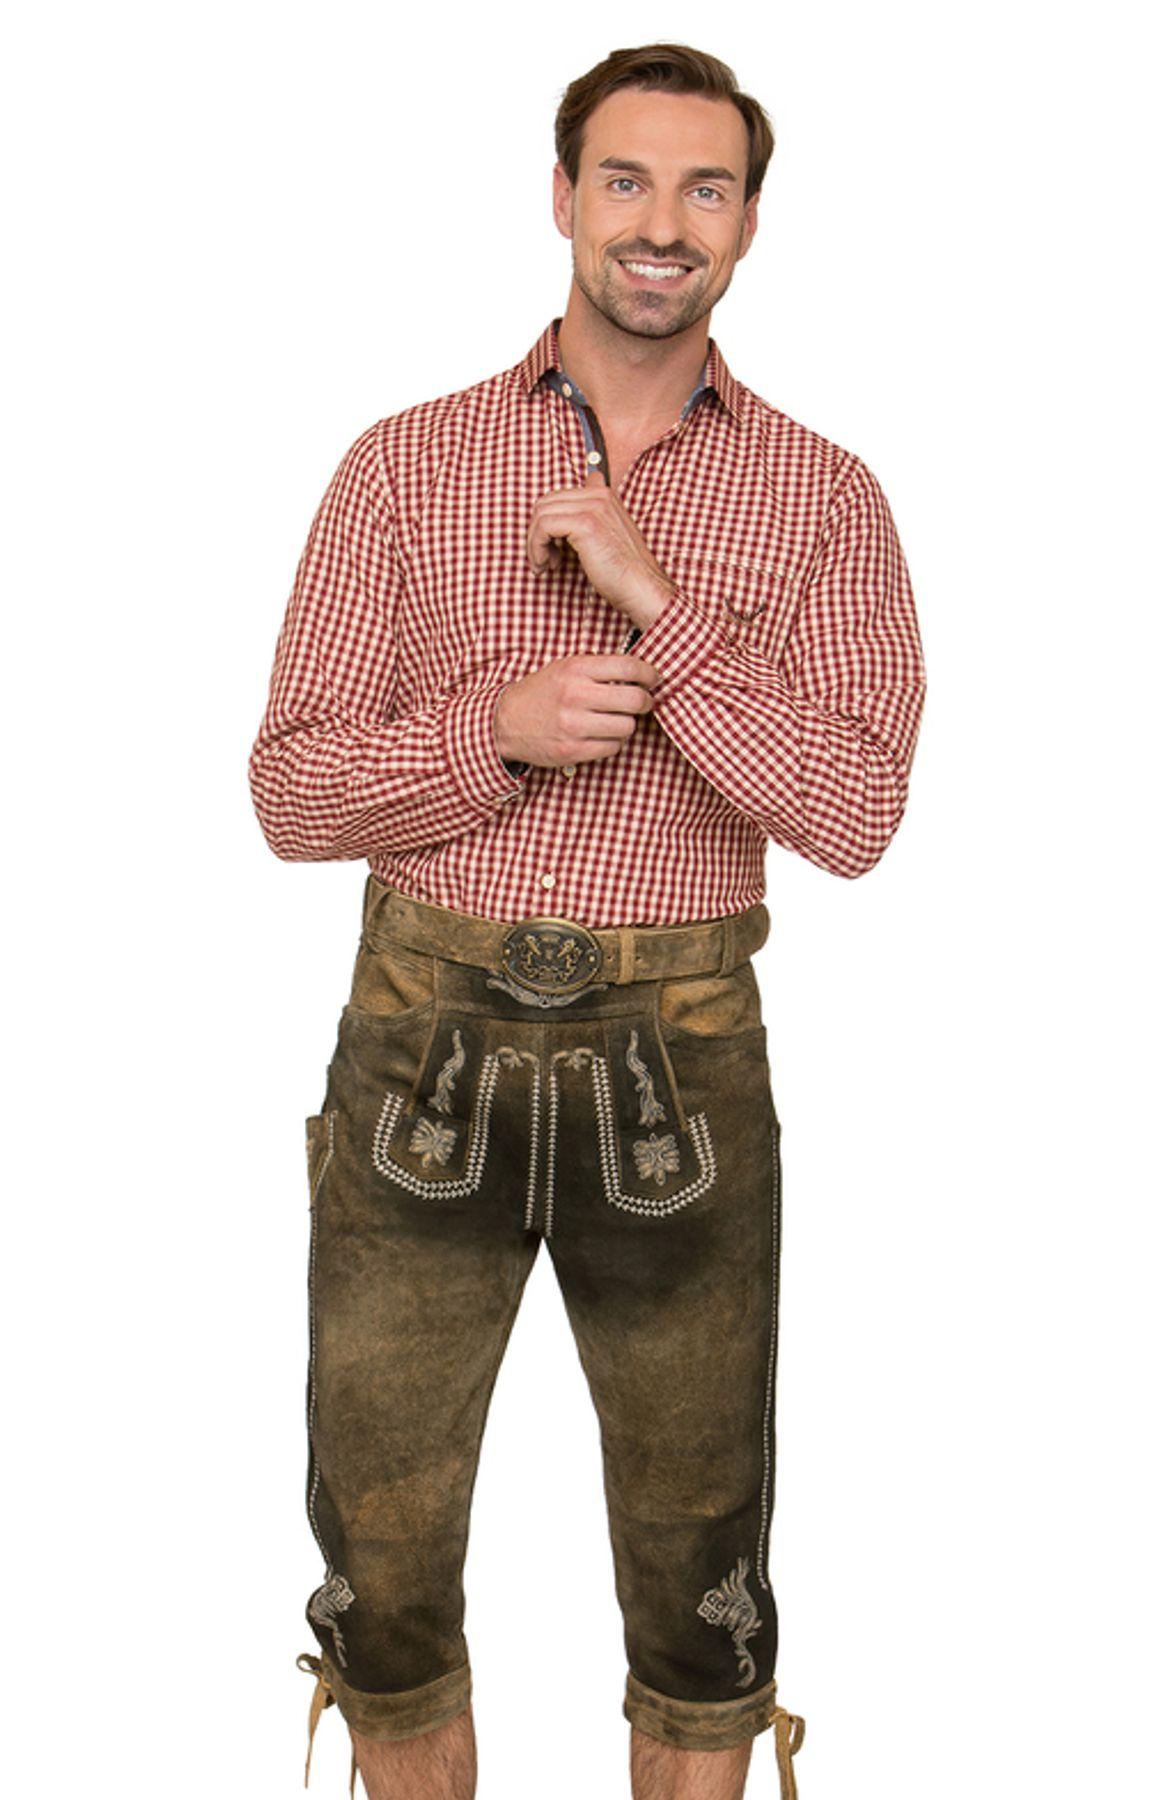 Stockerpoint - Herren Trachten Lederhose mit Gürtel, in uroid gespeckt, Sebastian – Bild 2